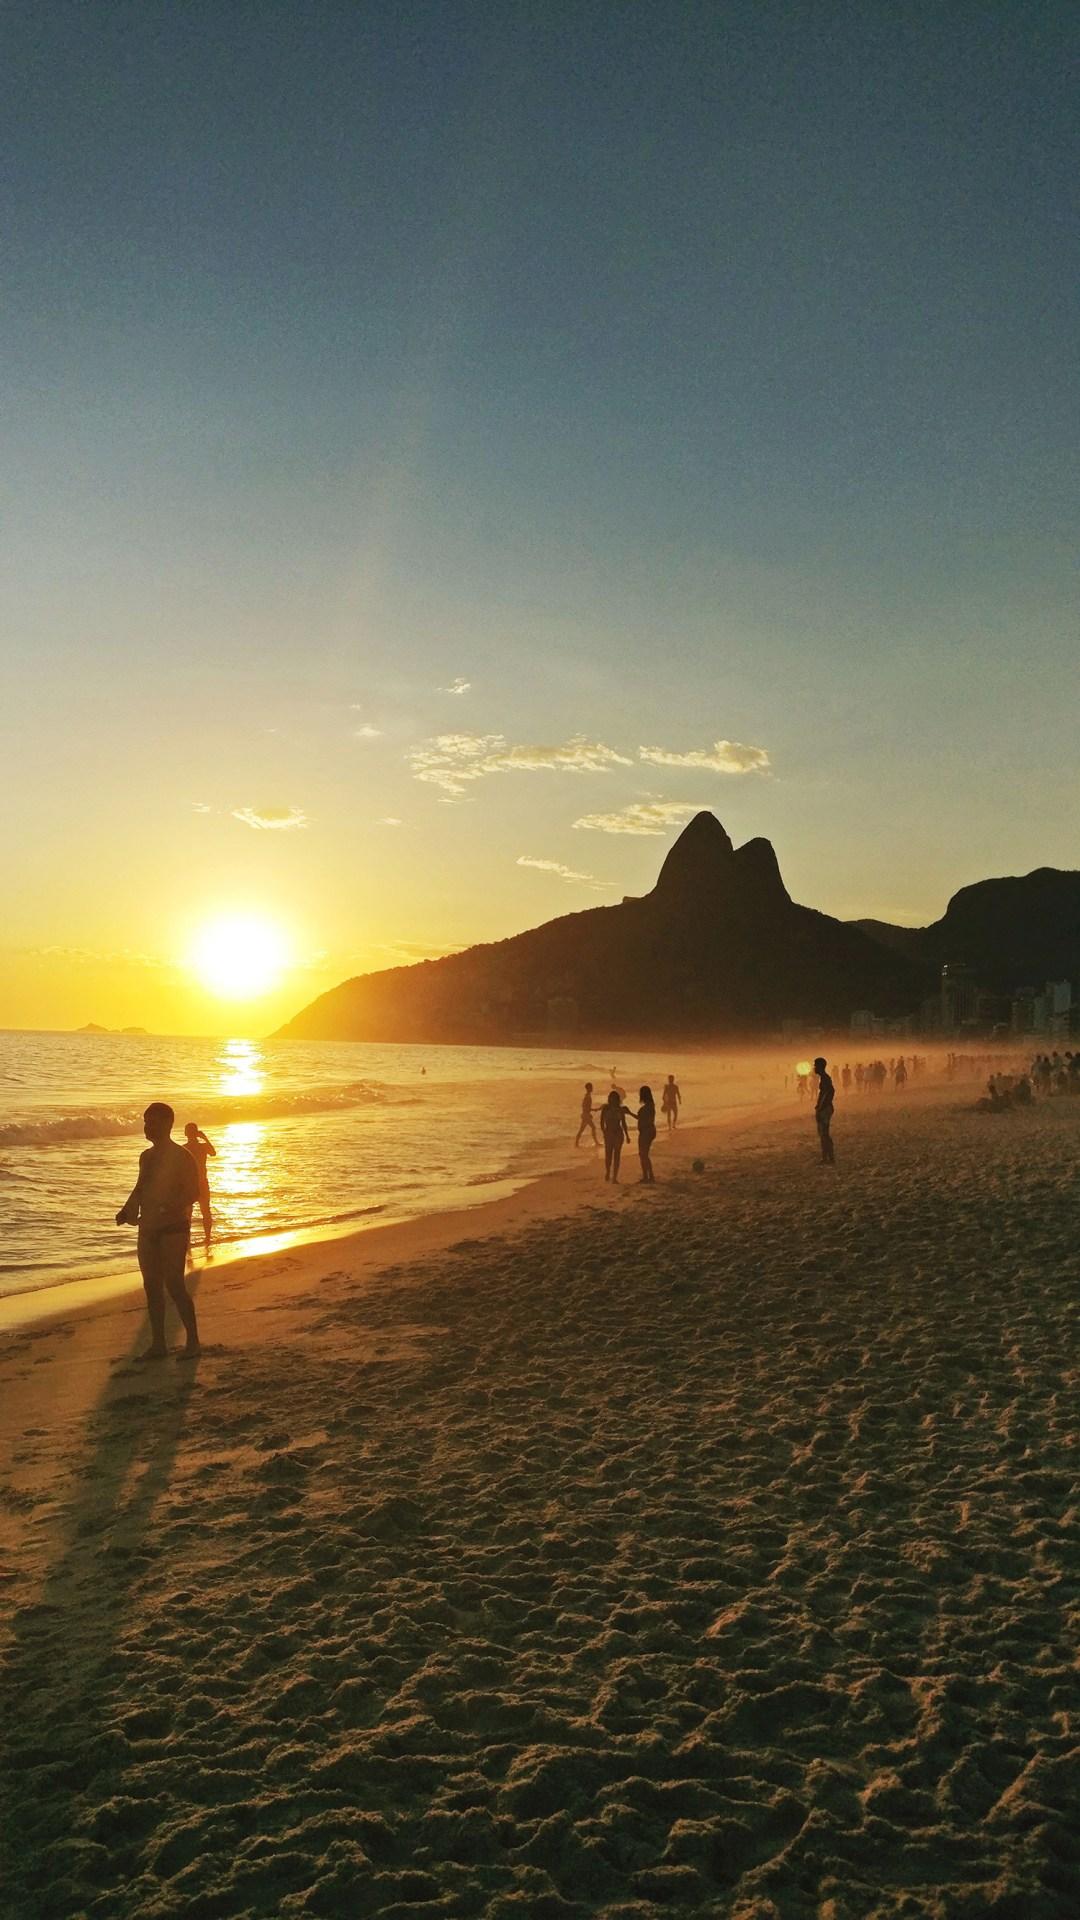 Sunset at Praia de Ipanema - Best beaches in Rio de Janeiro   Aliz's Wonderland